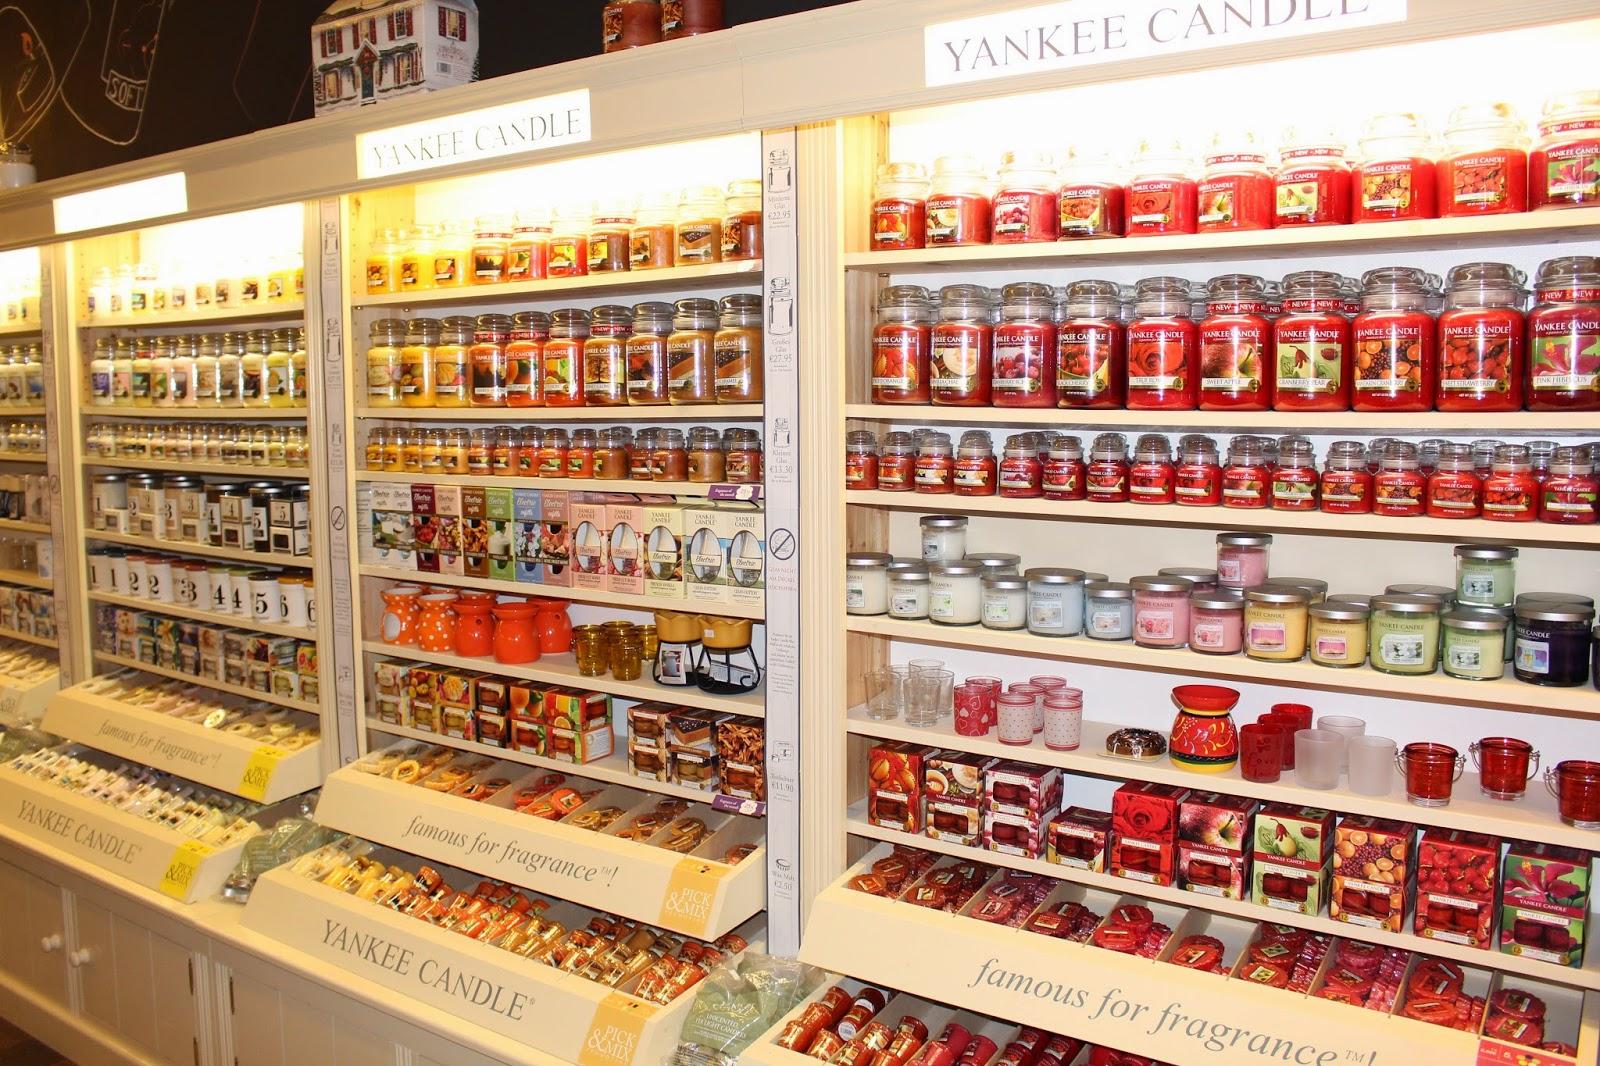 Yankee Candle Amsterdam.Sharmaine Sarina Yankee Plaza De Yankee Candle Winkel In